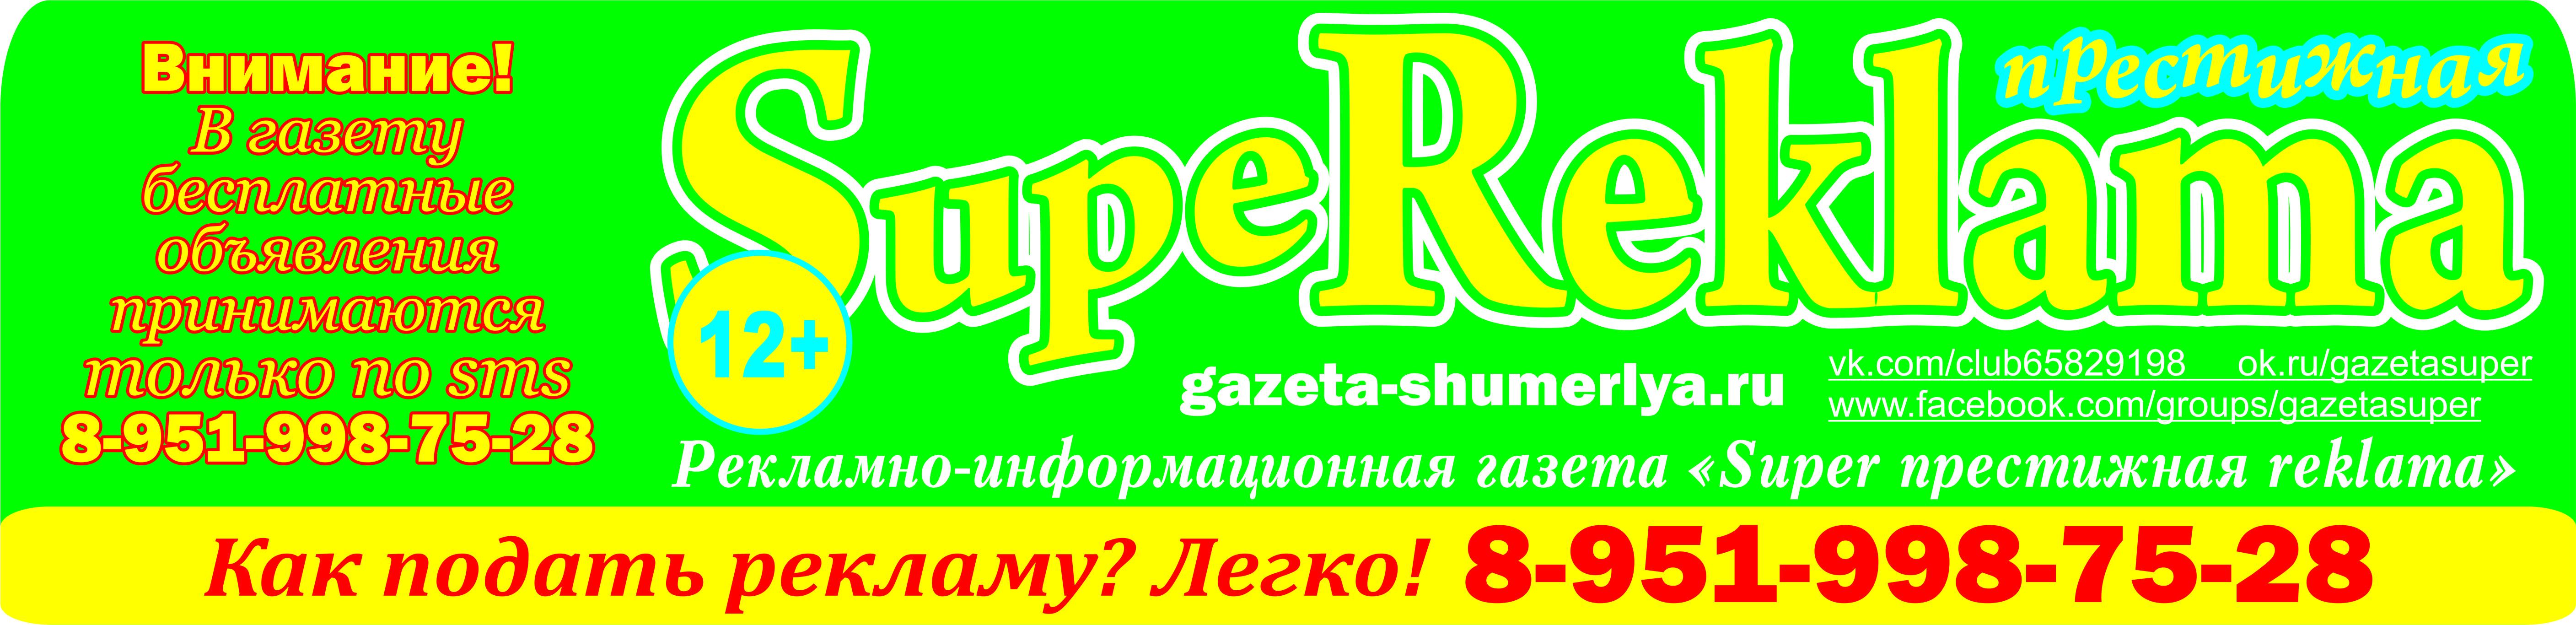 Газета Шумерля | gazeta-shumerlya.ru